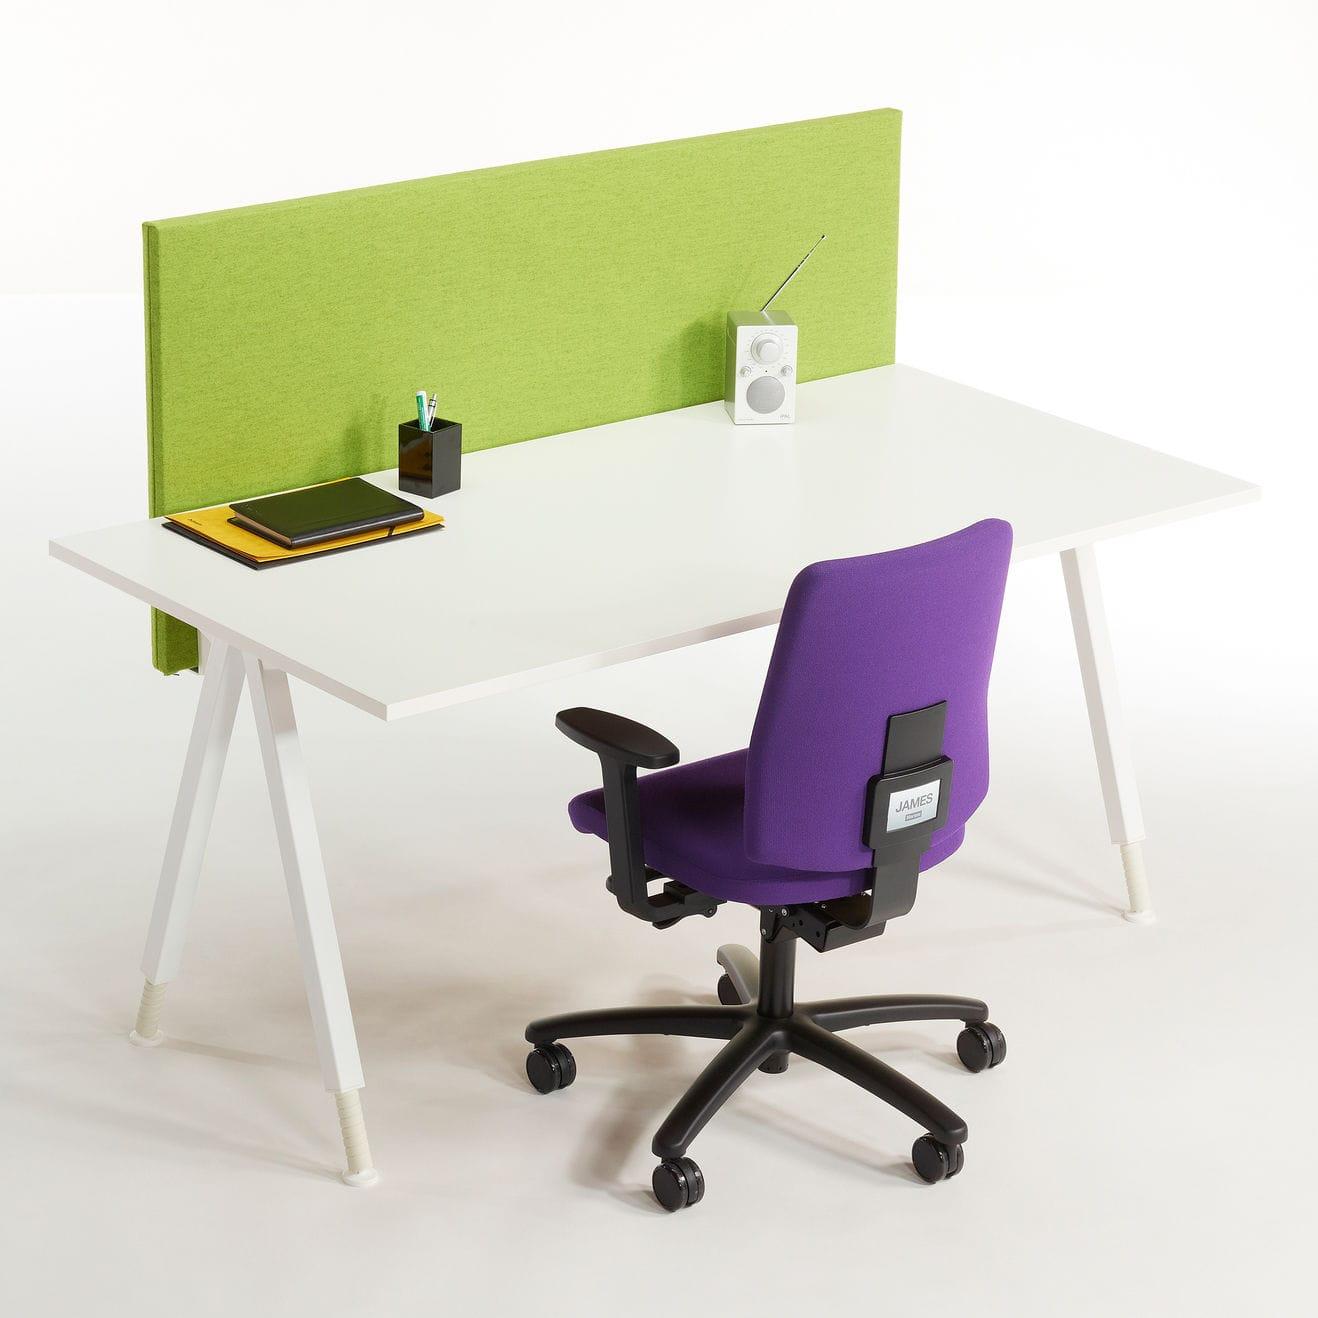 Bürotrennwand für Theken / Holz - FACE by Iiro Viljanen & Pekka ...